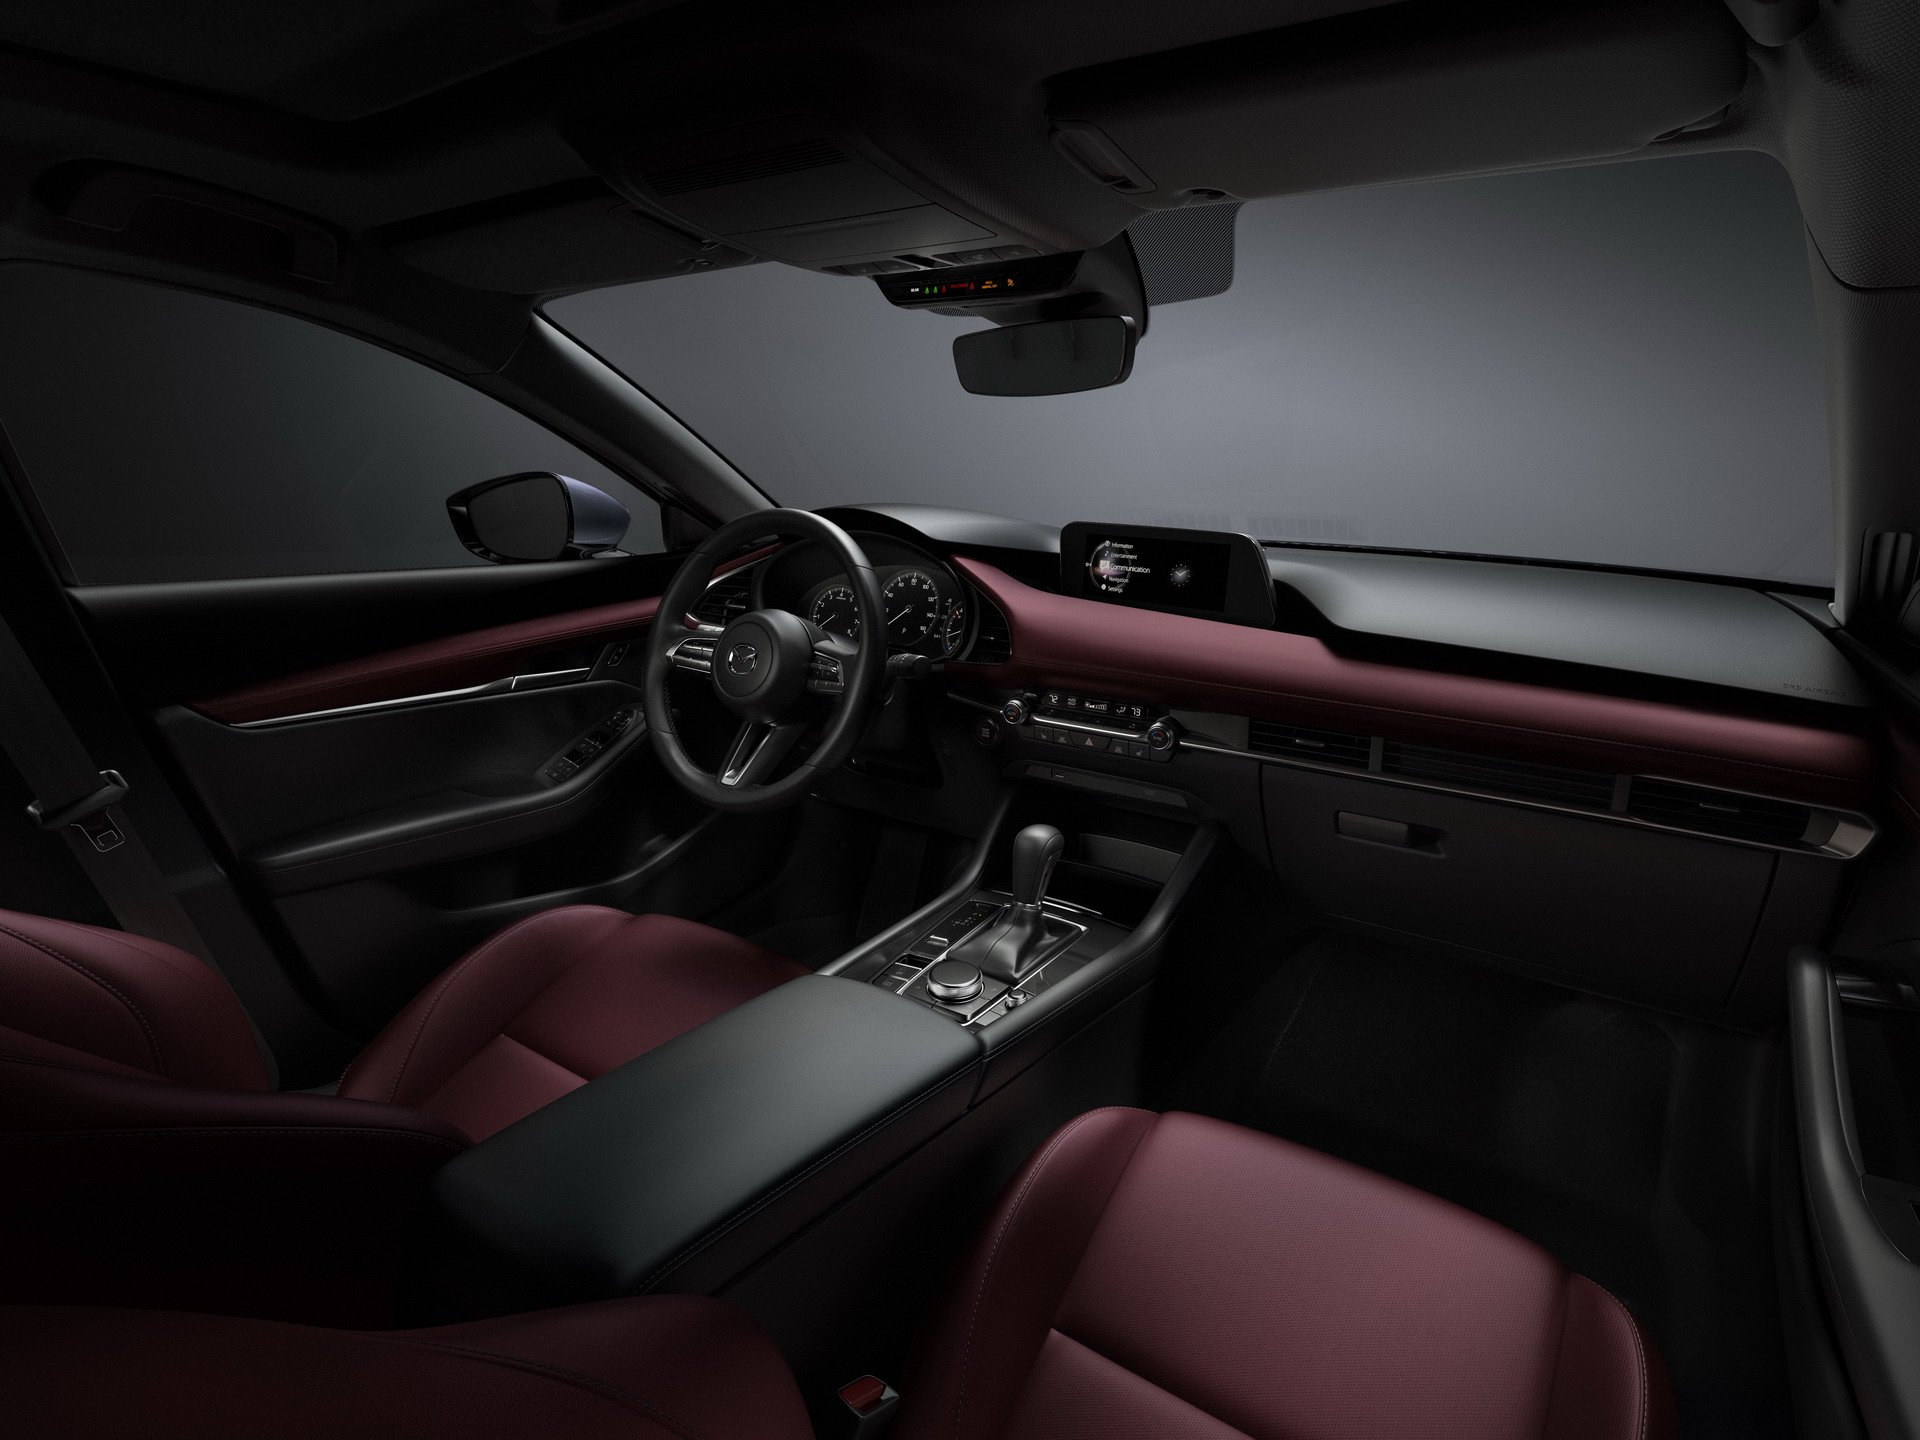 2019-mazda-3-sedan-hatch-10.jpg